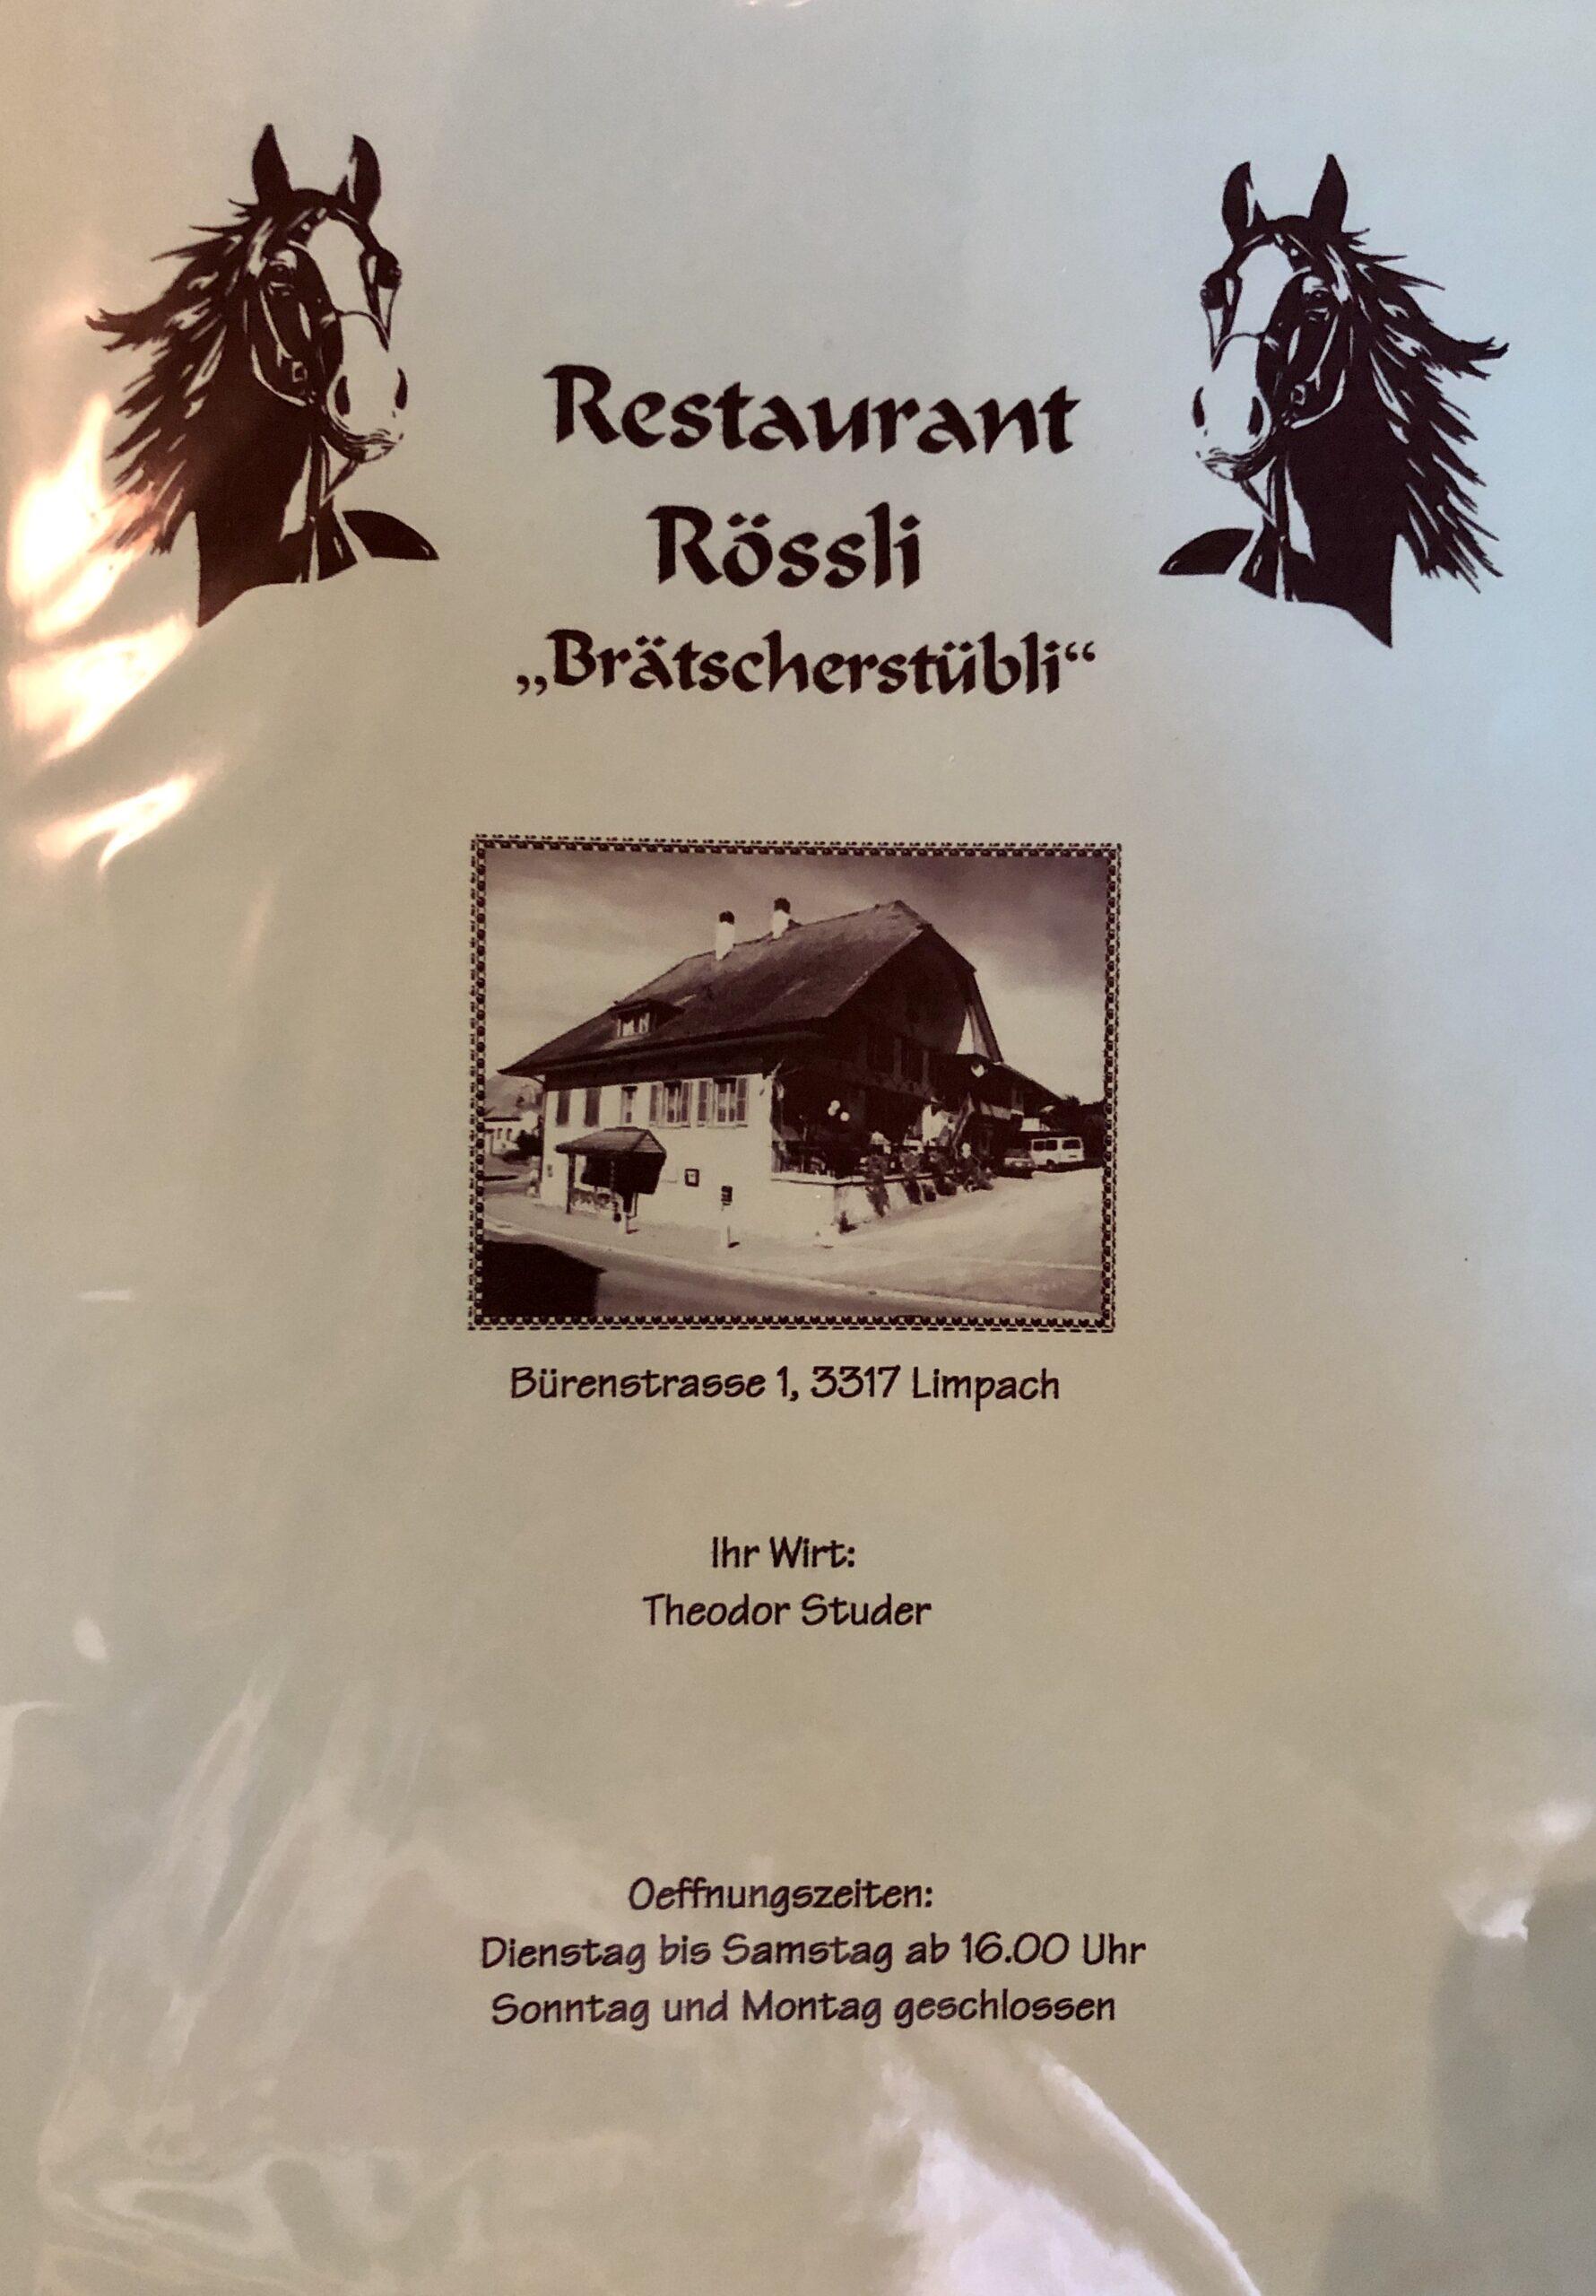 Restaurant Rössli Limpach